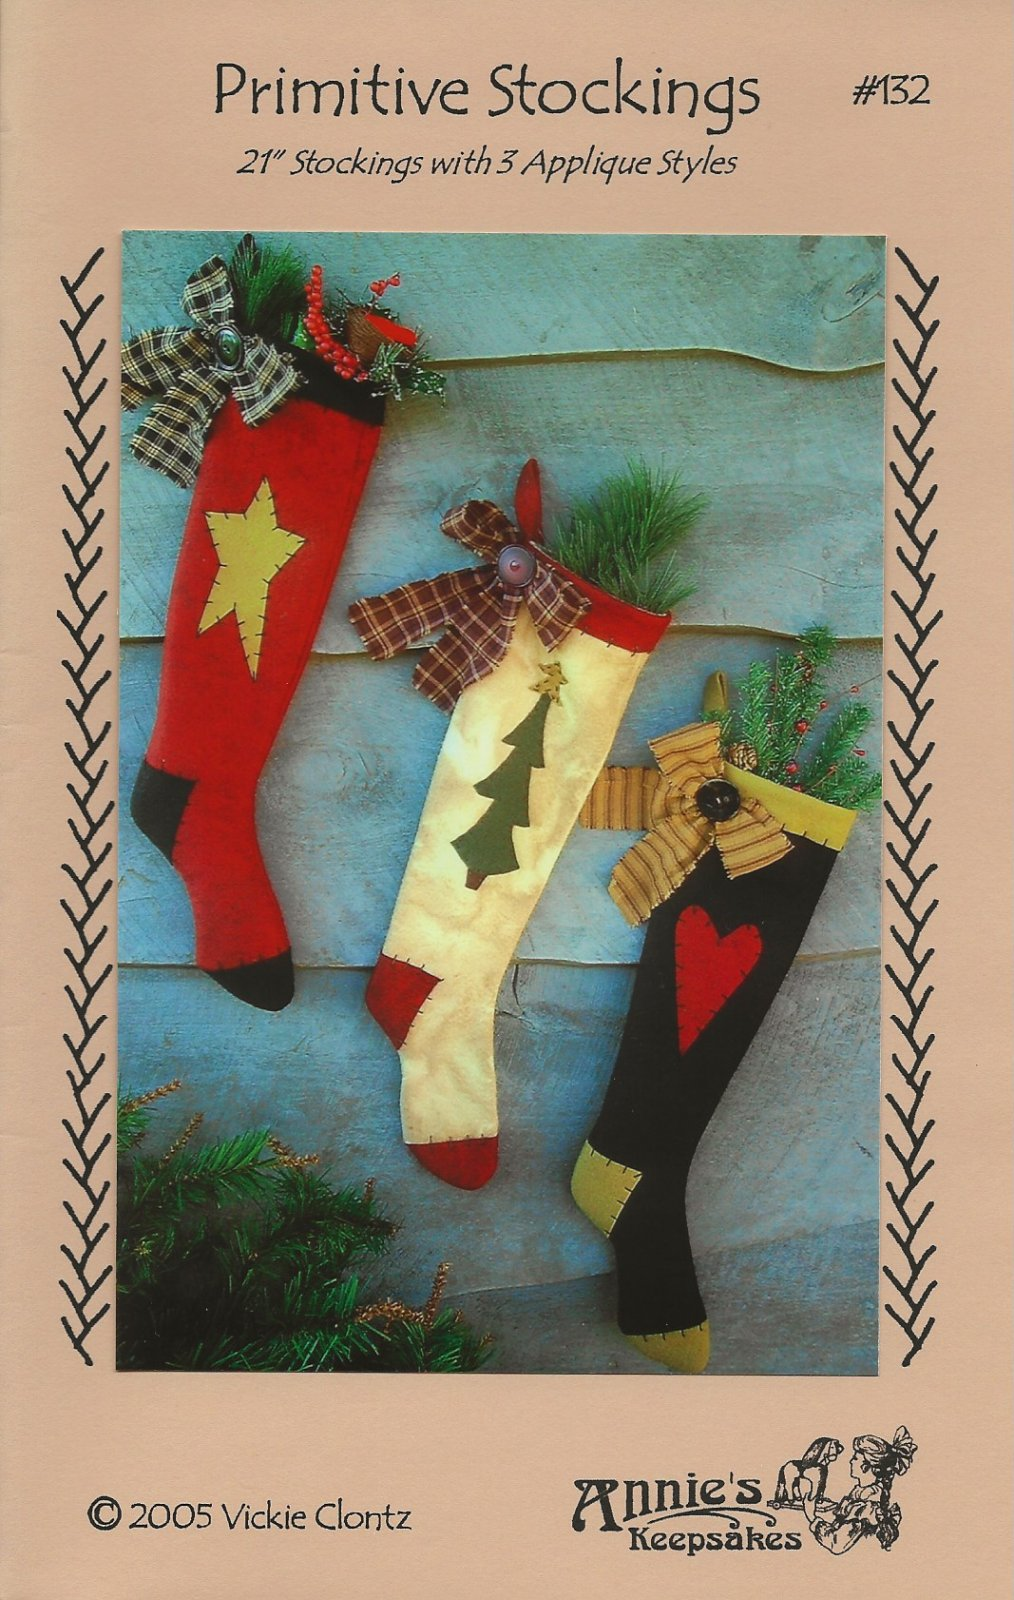 Primitive Stockings